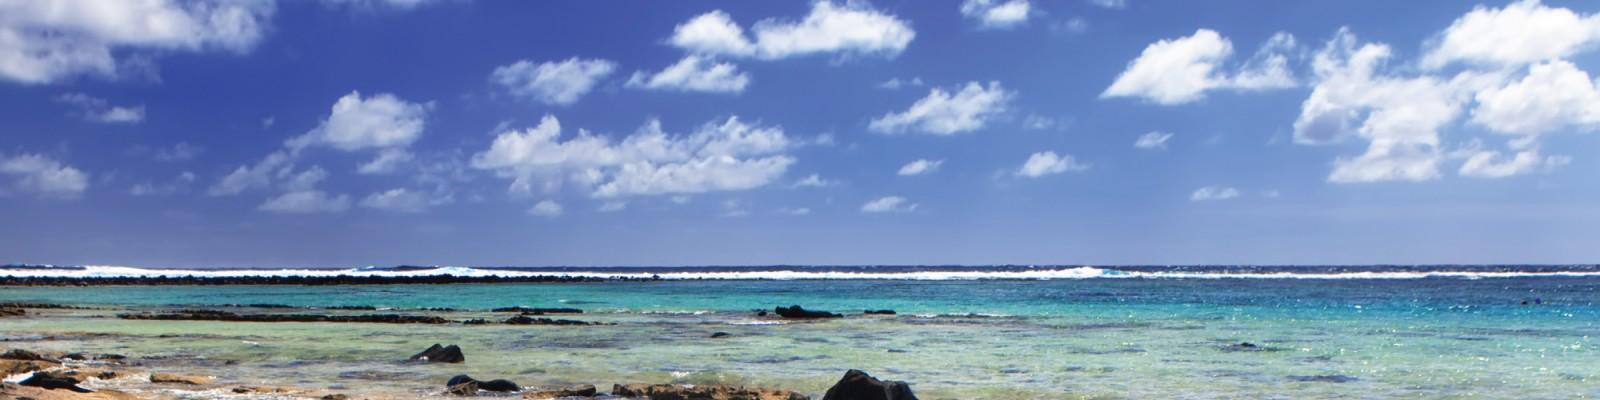 Tenrag Yacht Charter: Mauritius